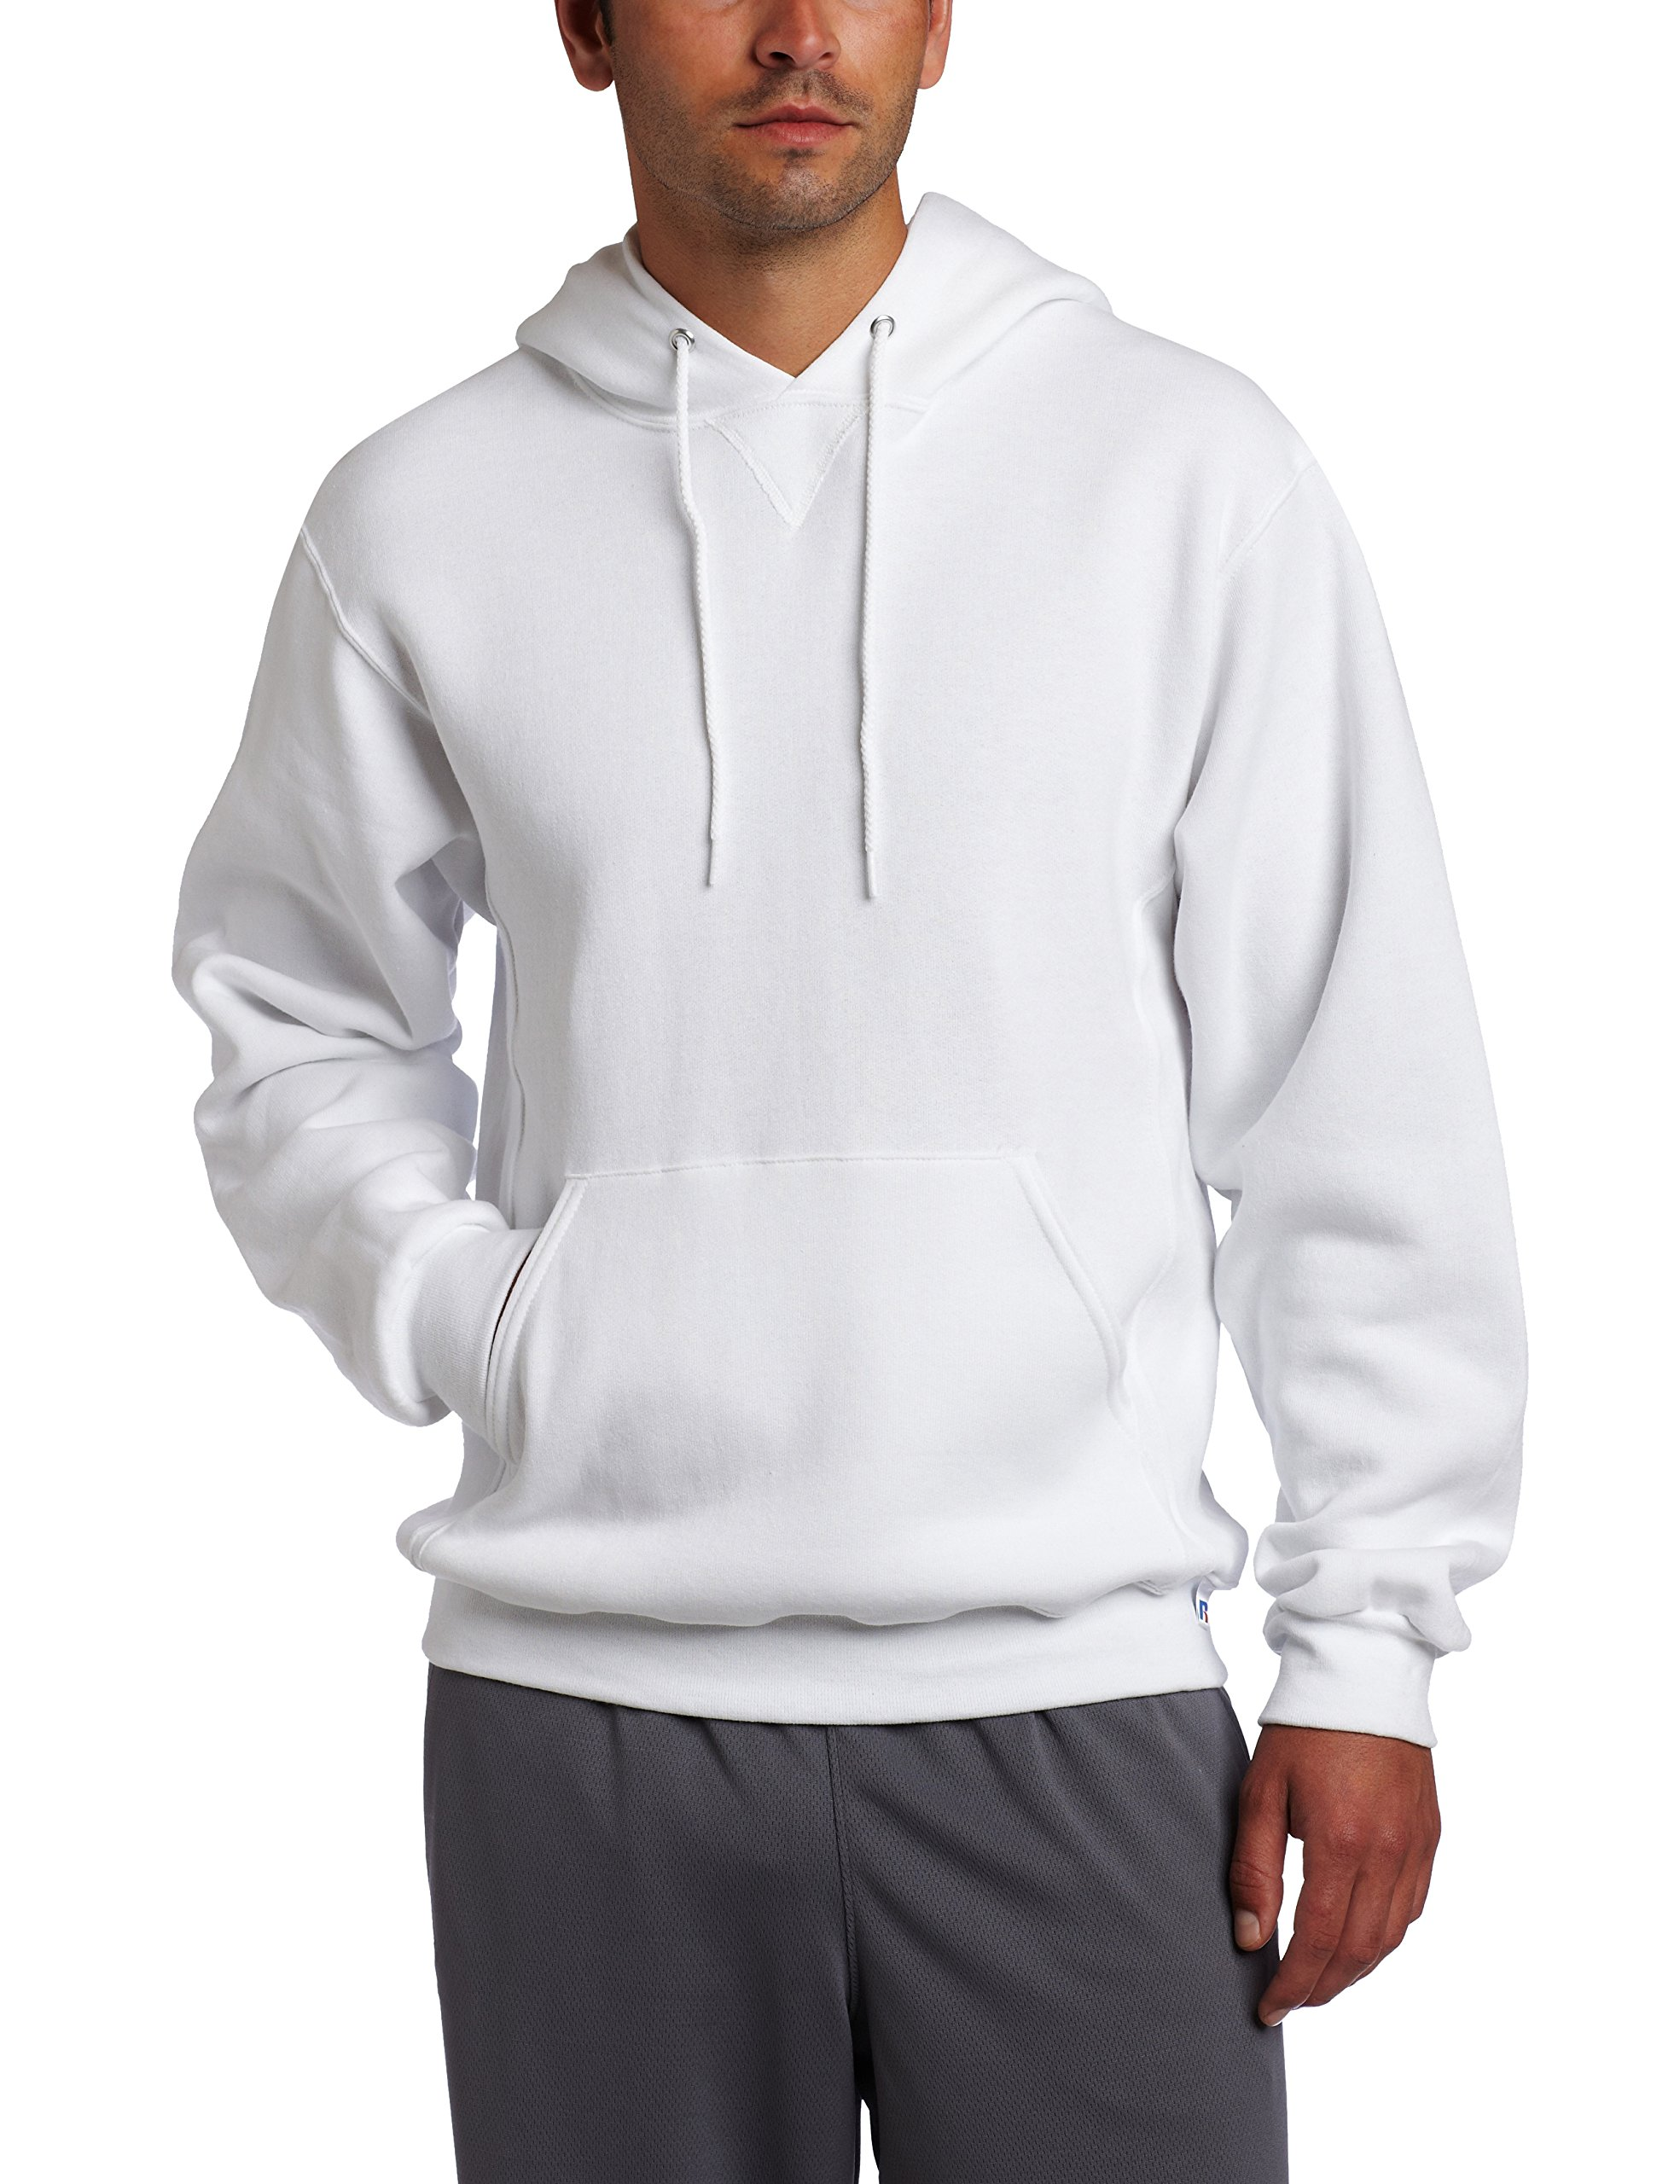 Dri-Power Fleece Pullover Hood - White - XXXX-Large